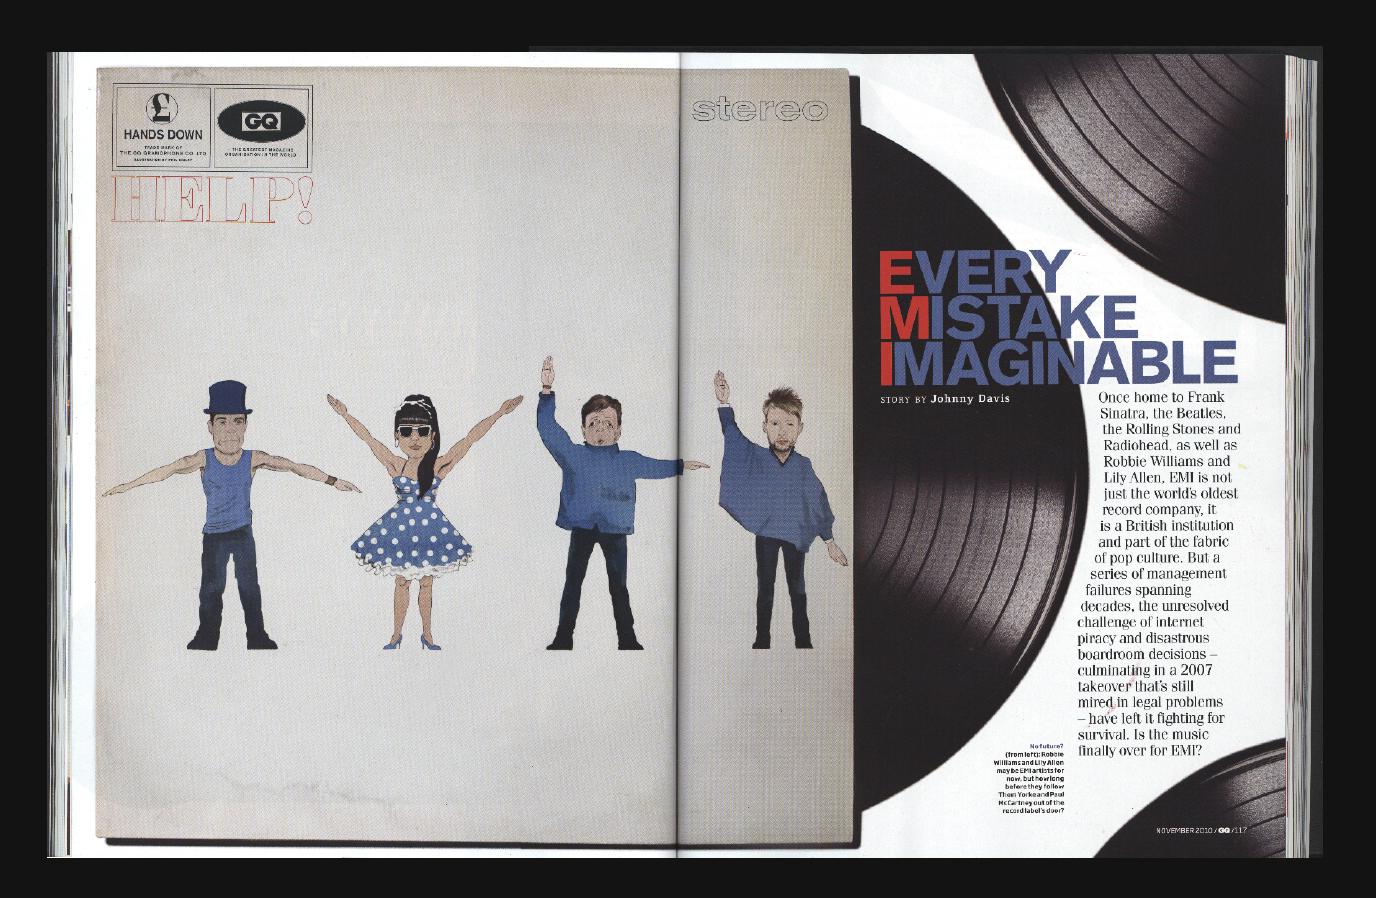 Phil Disley / EMI Help! / GQ Magazine